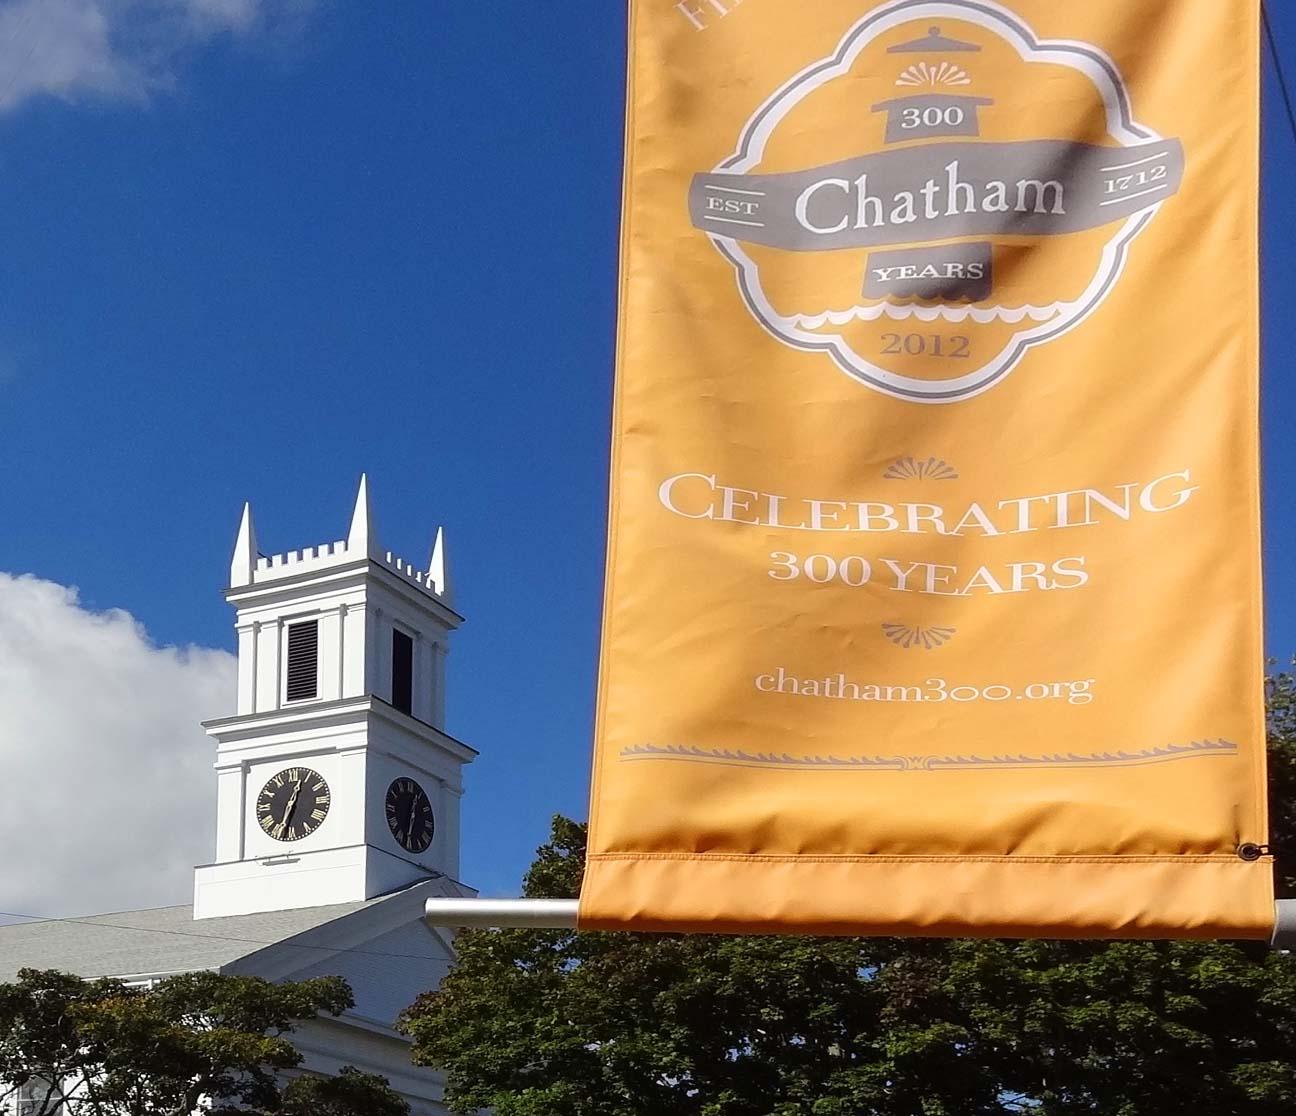 Joe's Retirement Blog: Downtown, Chatham, Cape Cod